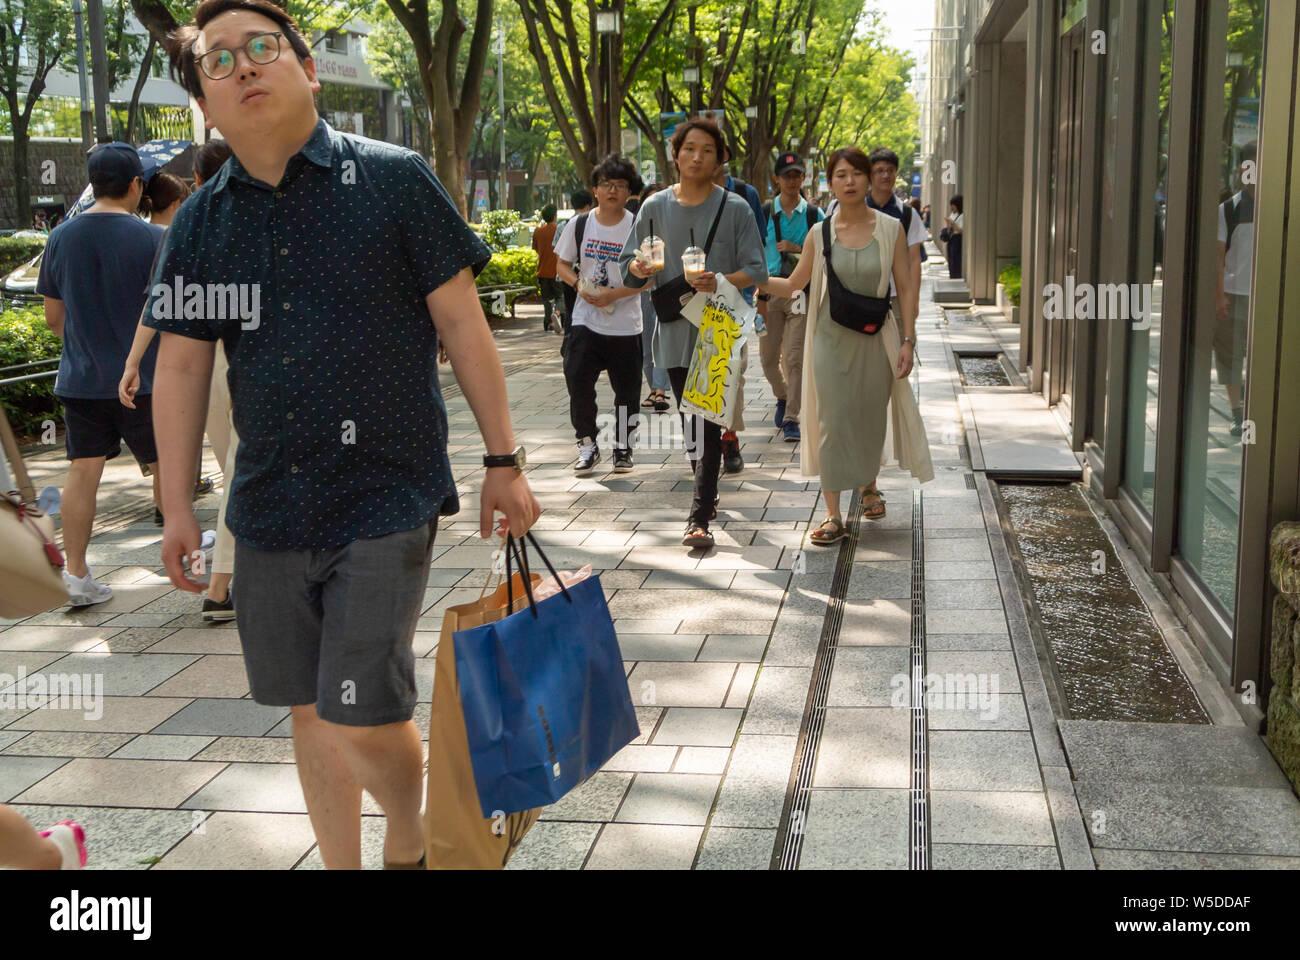 Japanese Pedestrians in the street of Omotesando, tokyo, japan, 2019 Stock Photo